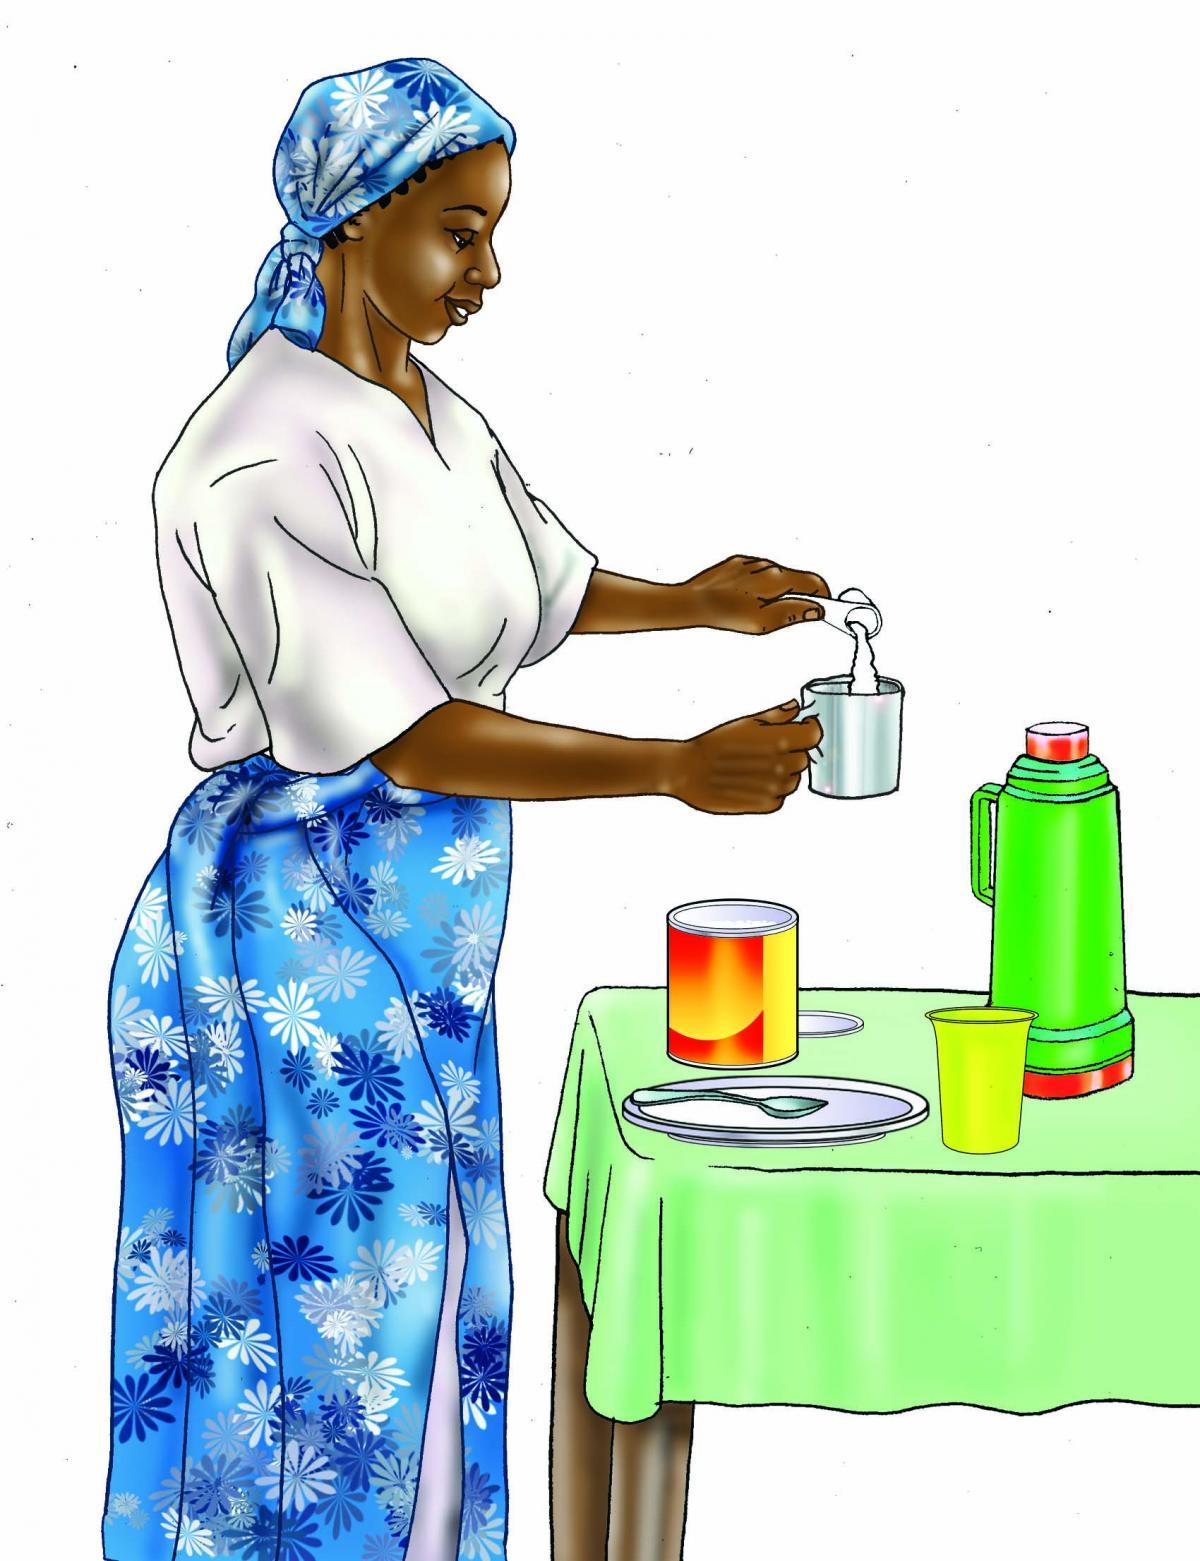 HIV - Preparing infant formula 0-24 mo - 02 - Tanzania